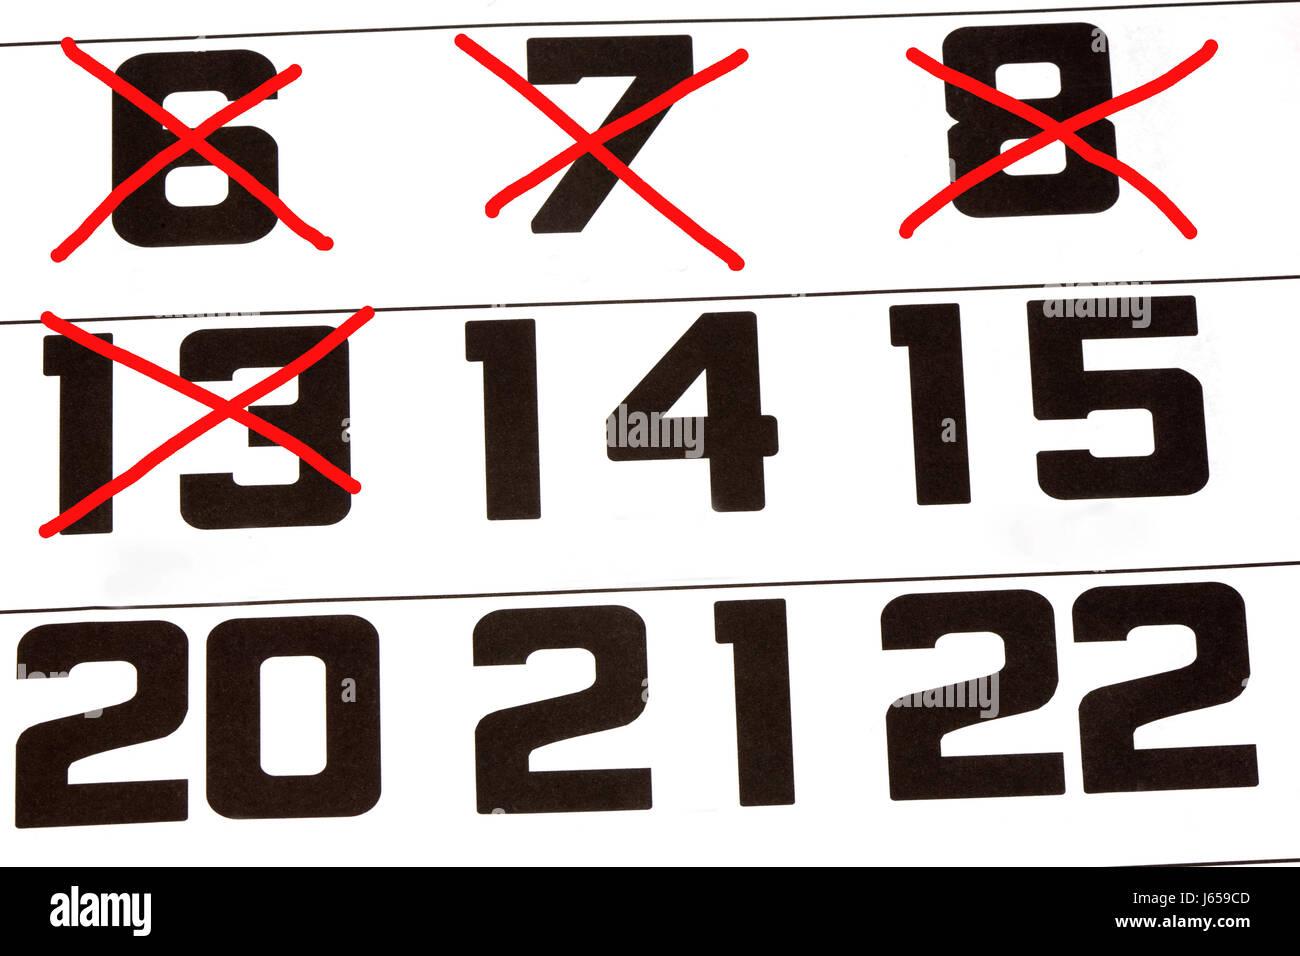 eliminate page number